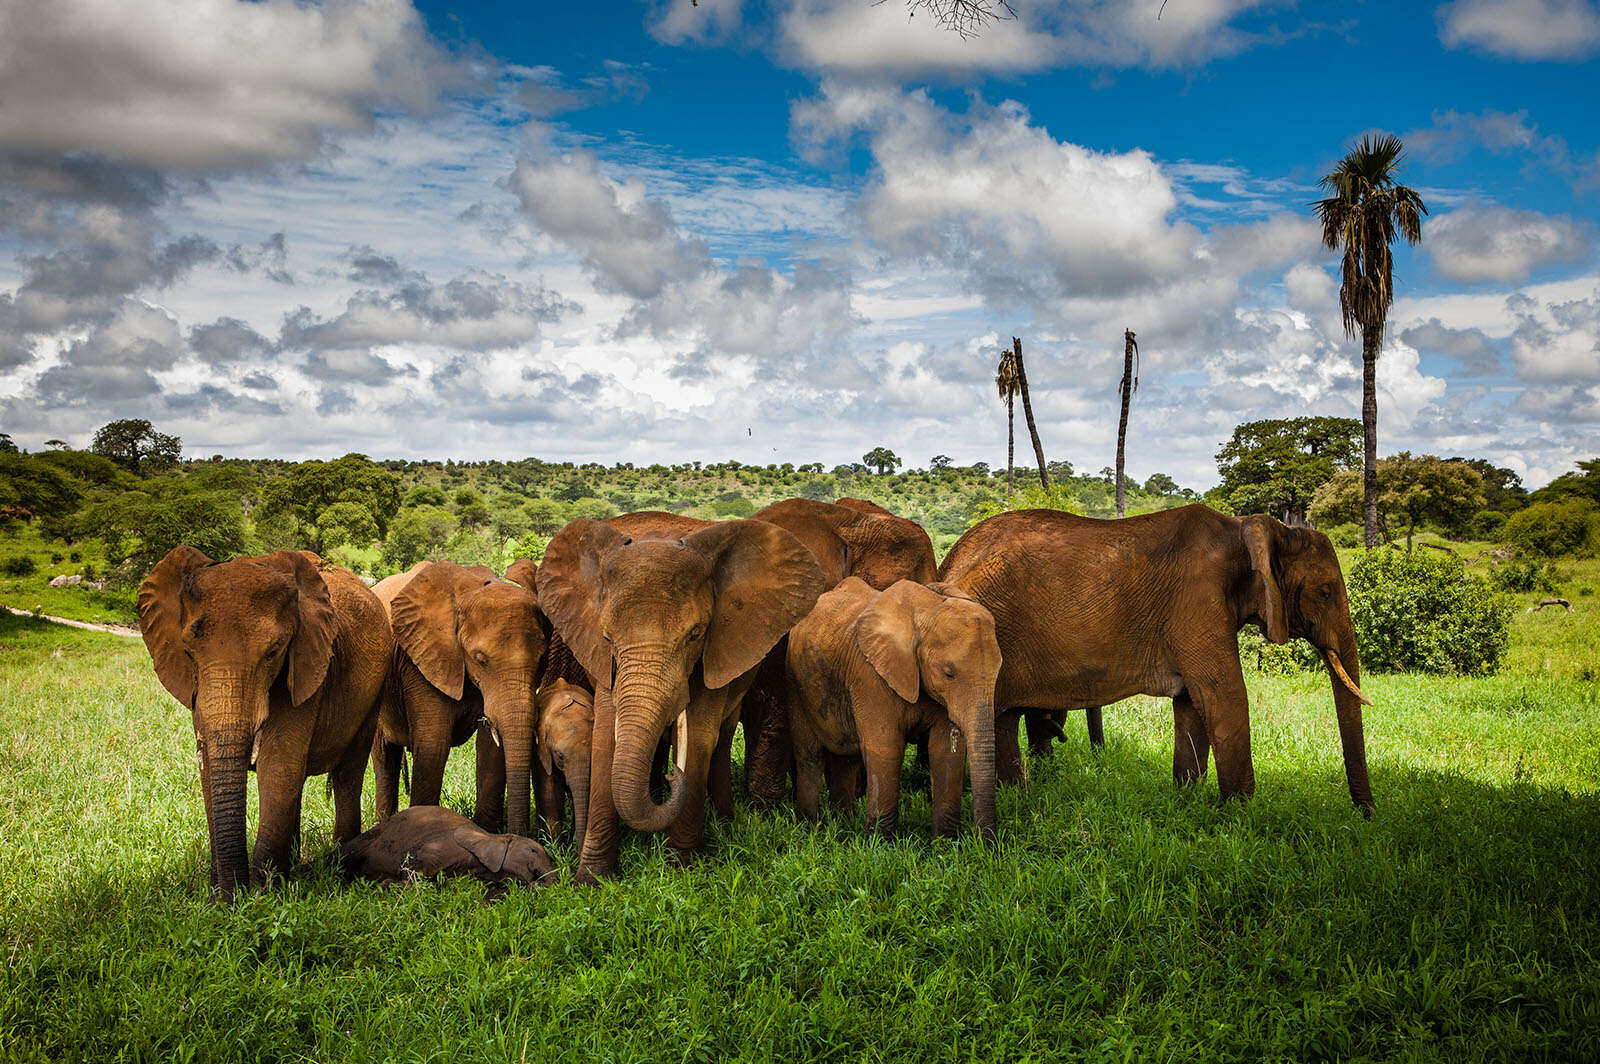 Goway Travel - Luxury Tanzania Sky Safari   Buy One, Partner Pays 50%